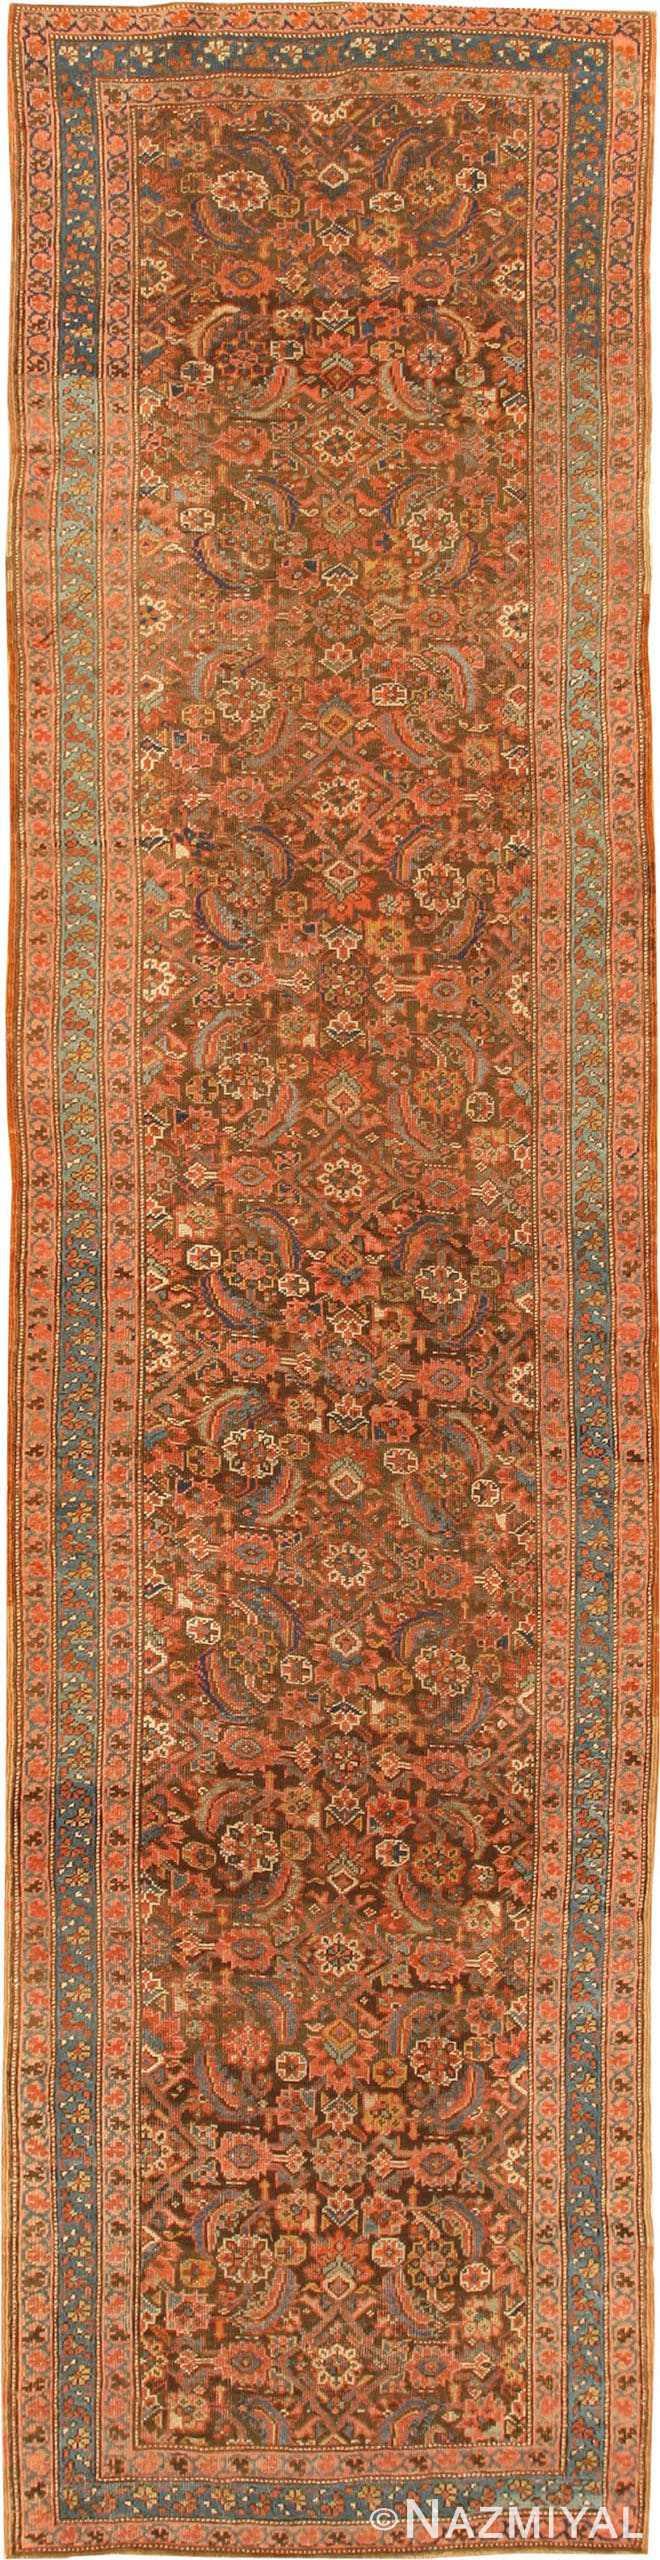 Antique Bakshaish Persian Runner Rug 42365 by Nazmiyal